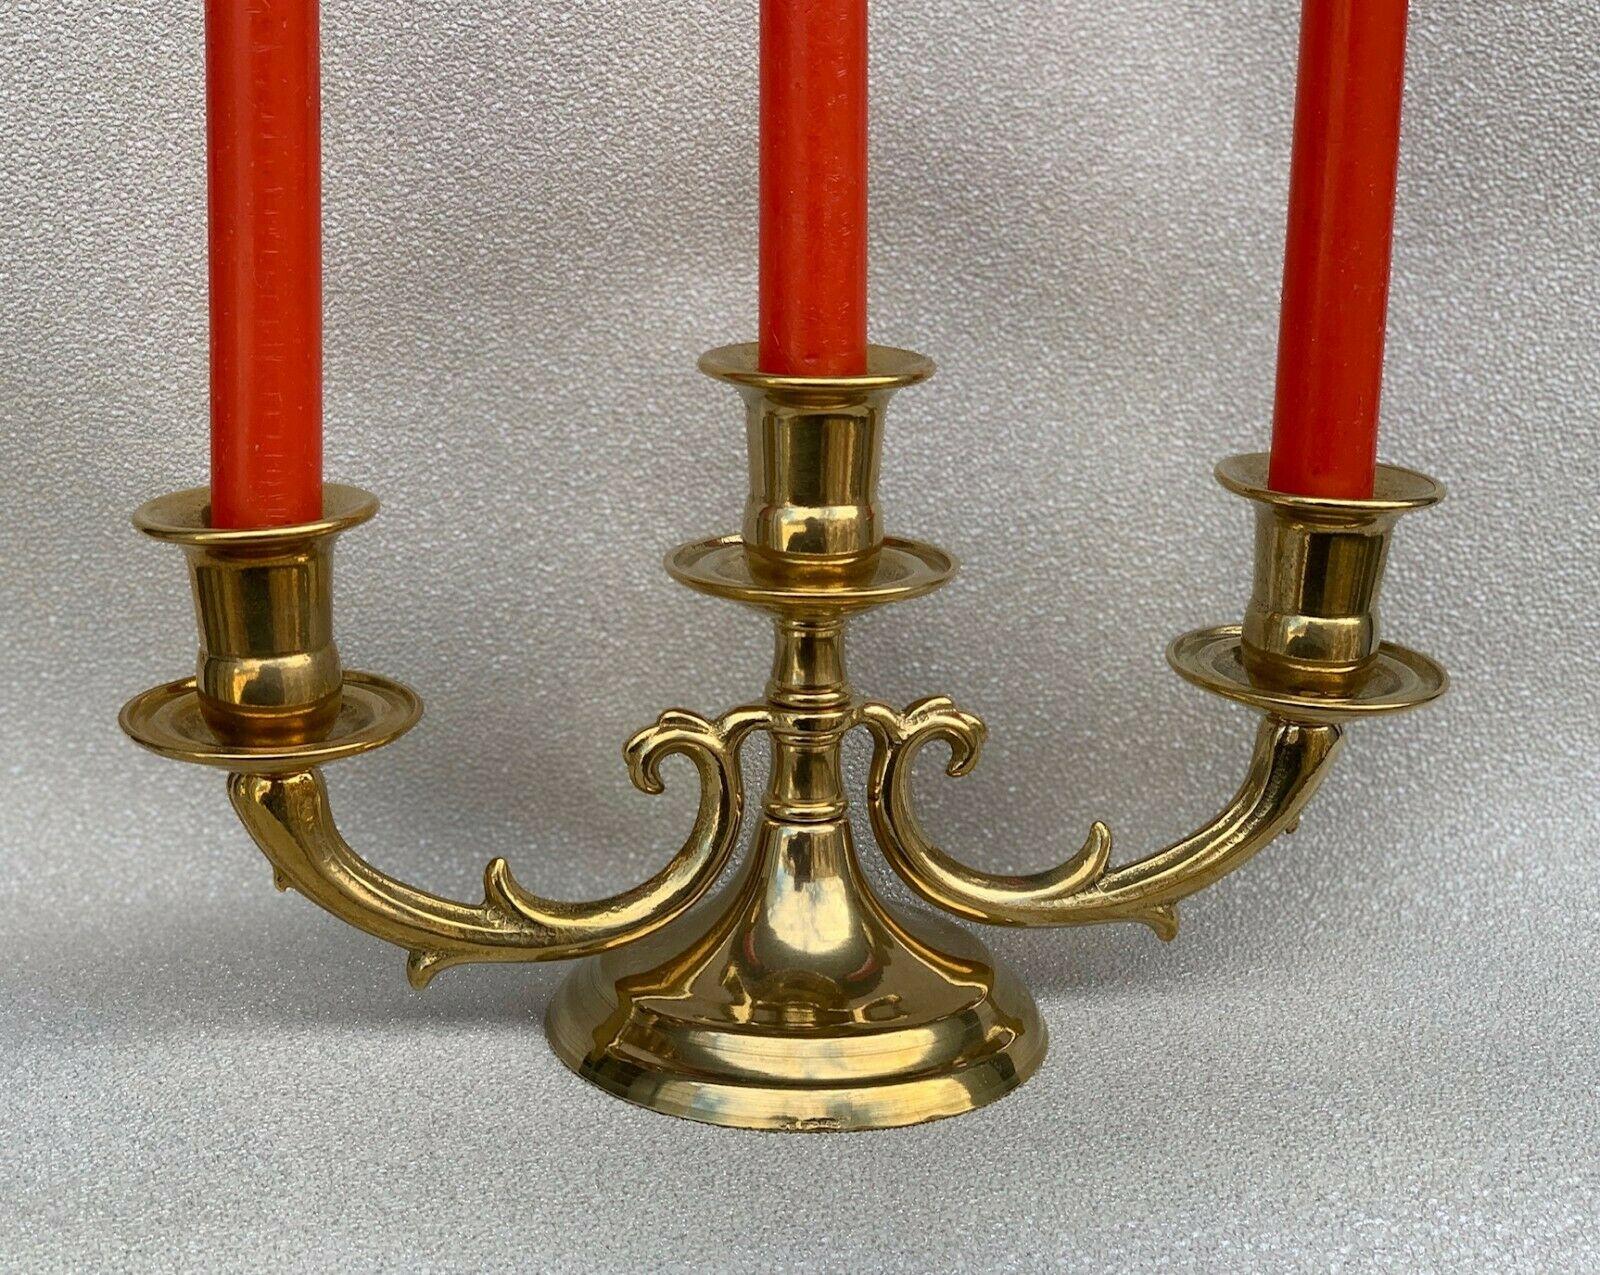 Kerzenleuchter Kerzenhalter Kerzenständer Tischleuchter Messing Antik Barock